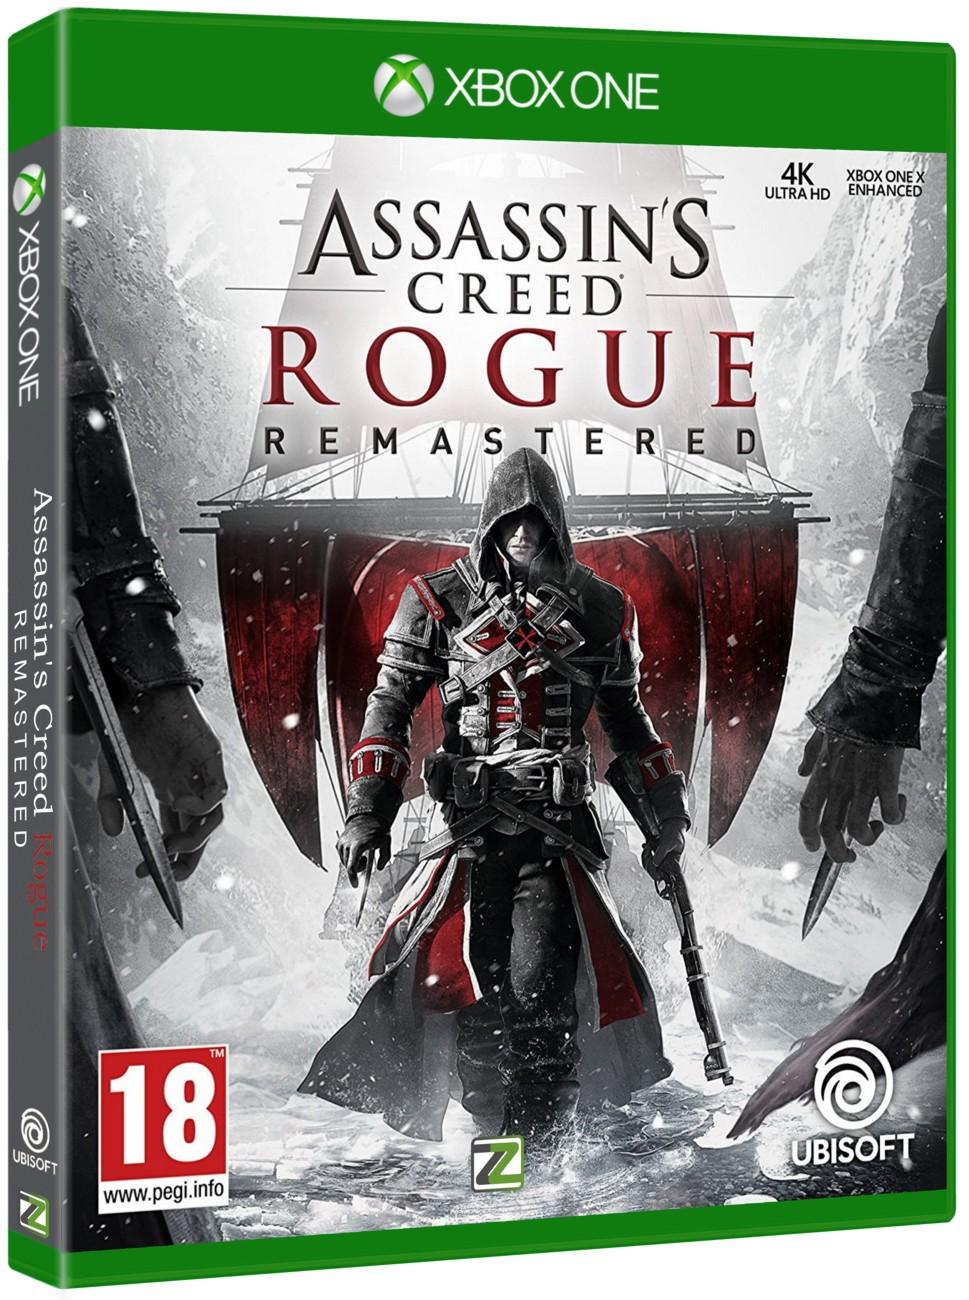 Assassin's Creed Rogue Remastered - Xone